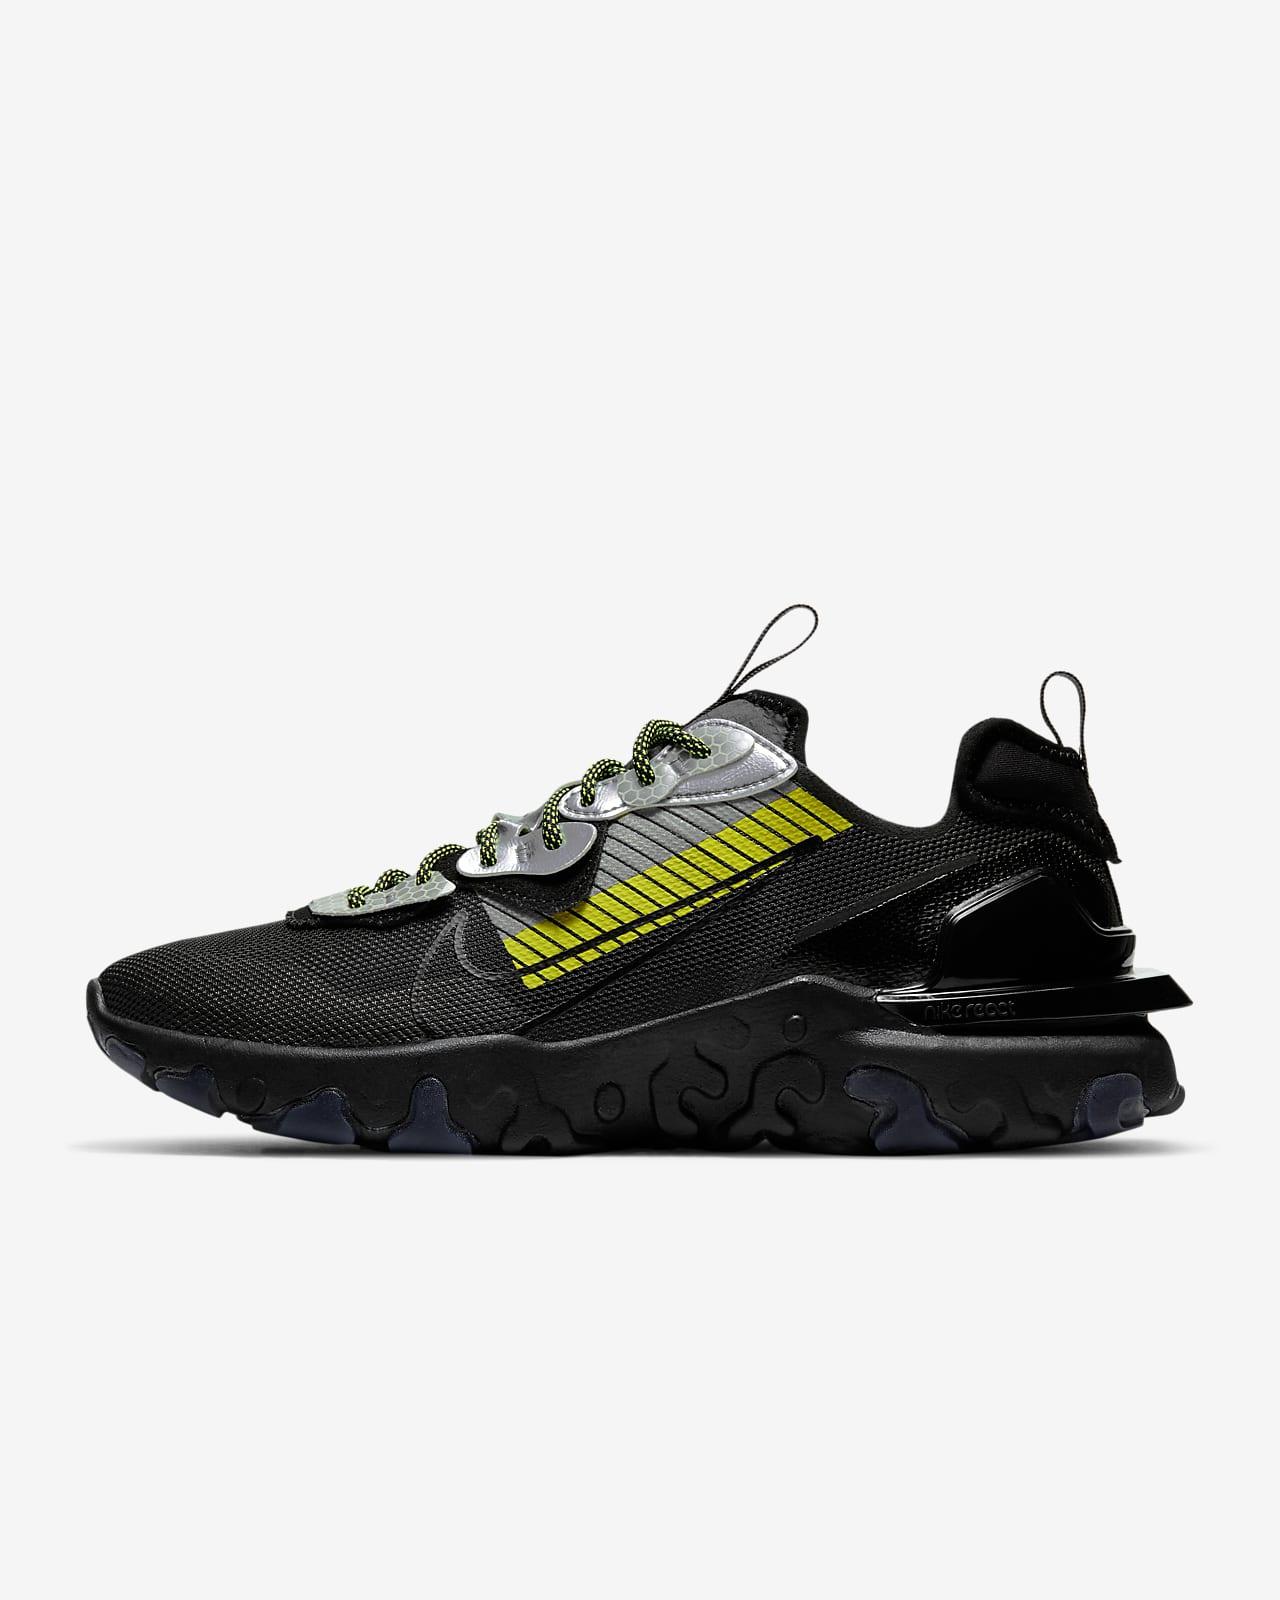 Chaussure Nike React Vision PRM 3M™ pour Homme